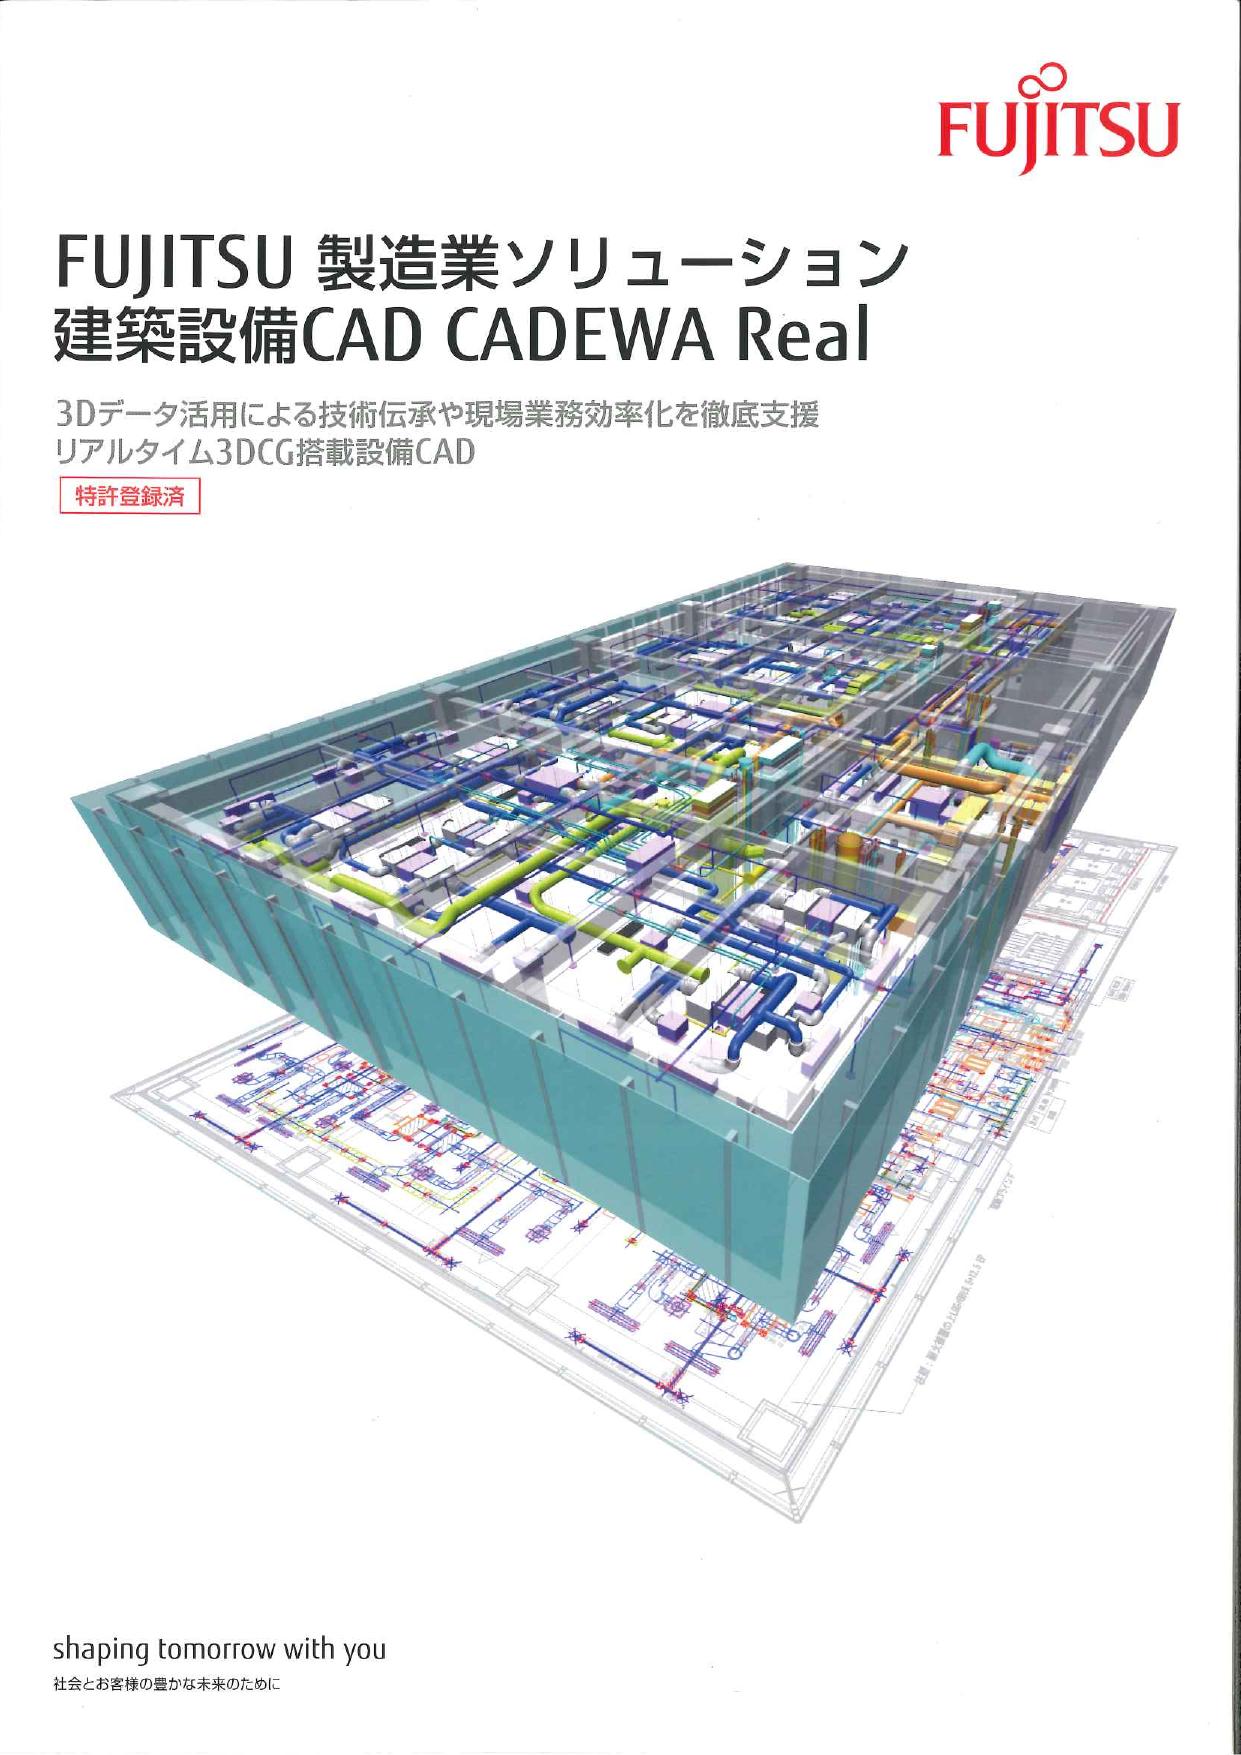 FUJITSU製造業ソリューション 建築設備CAD CADEWA Real